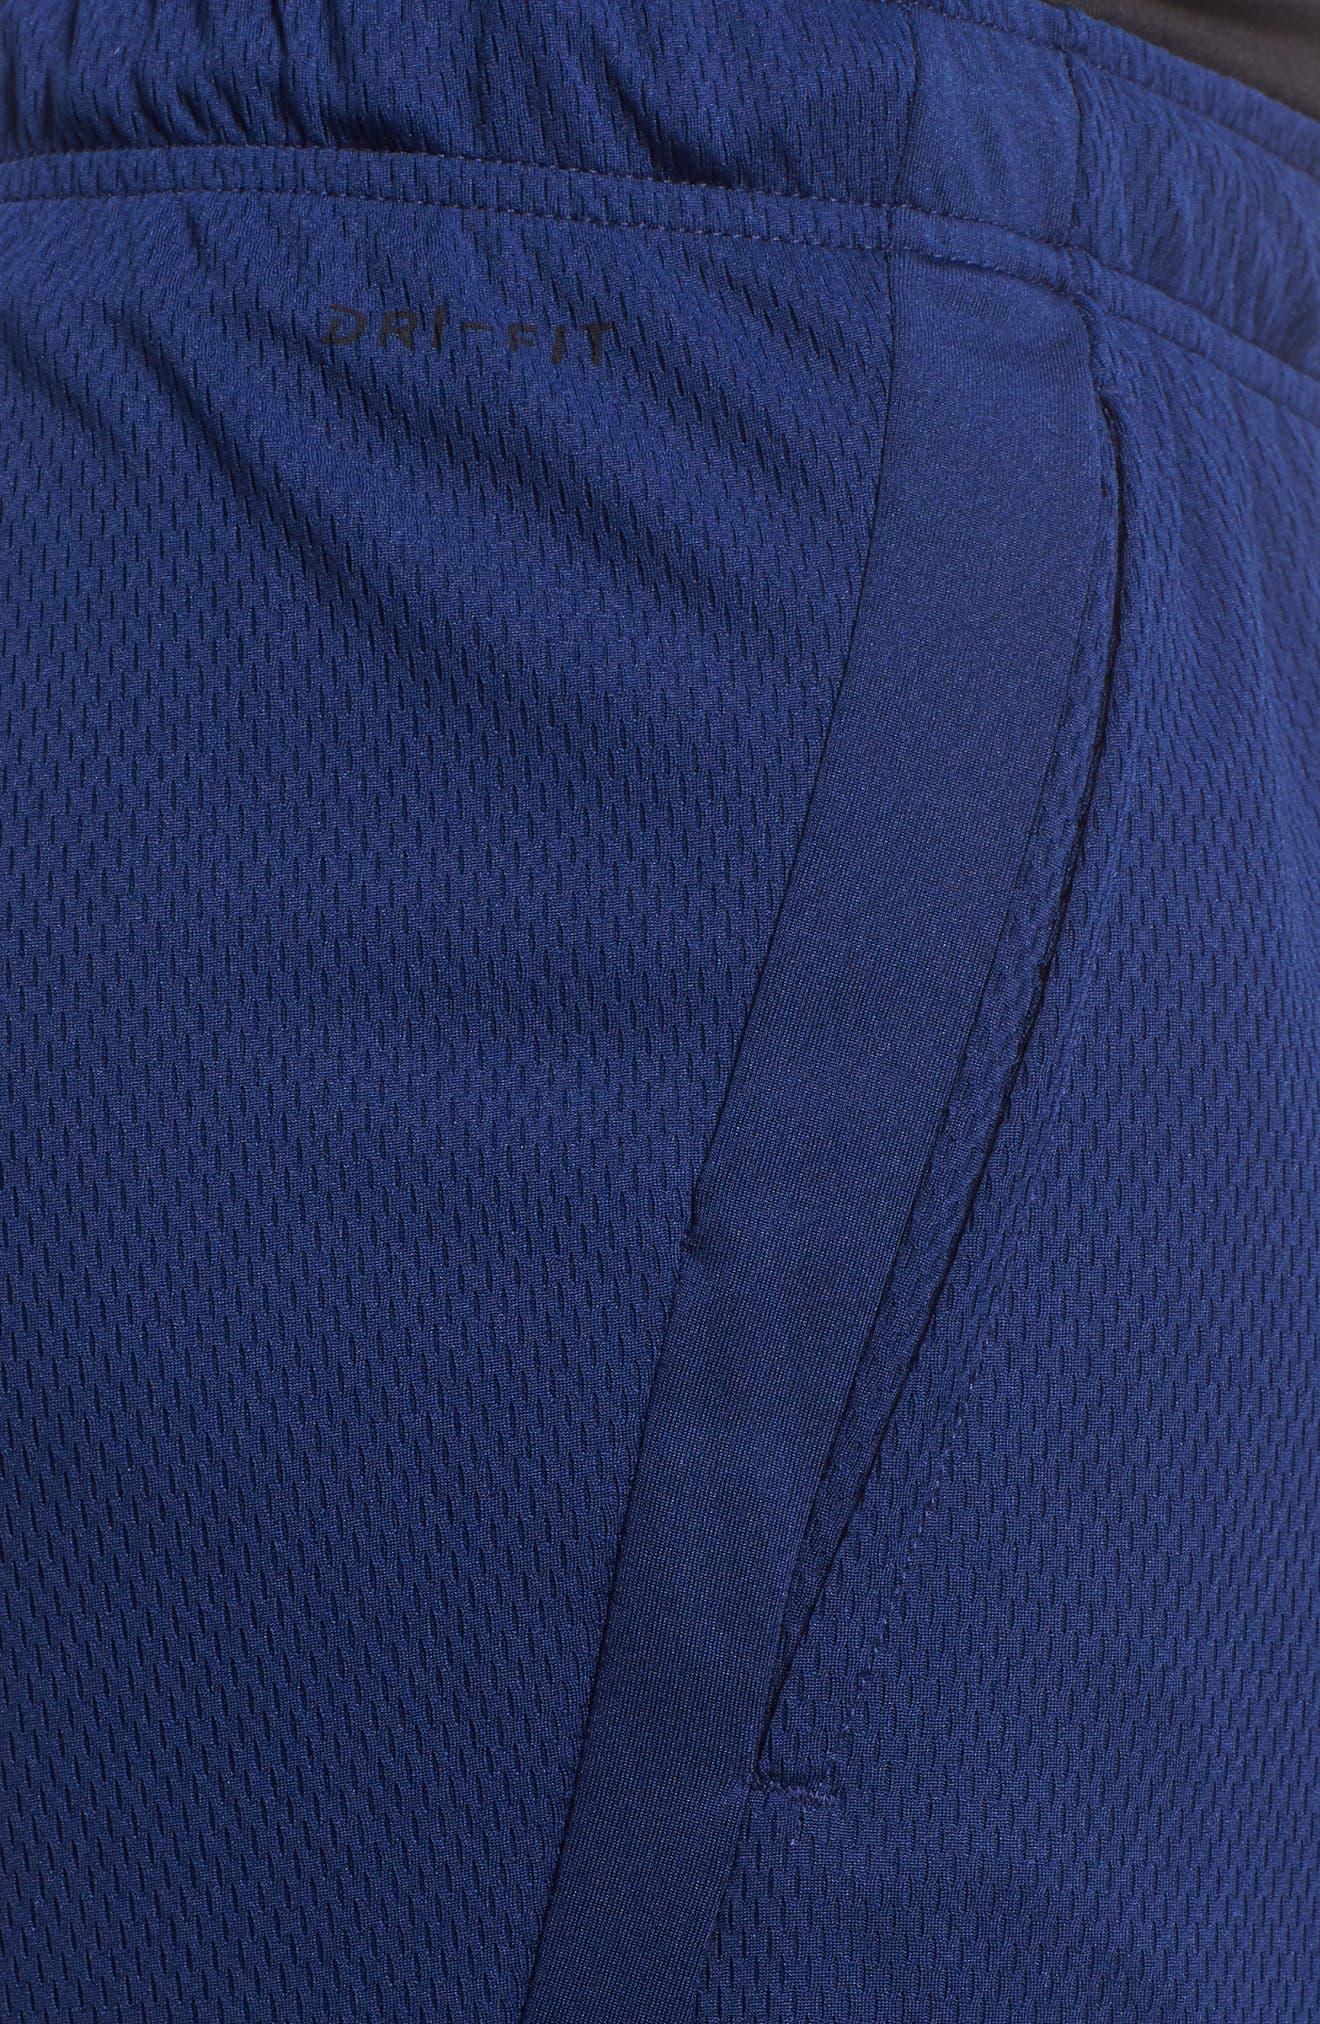 Training Dry 4.0 Shorts,                             Alternate thumbnail 22, color,